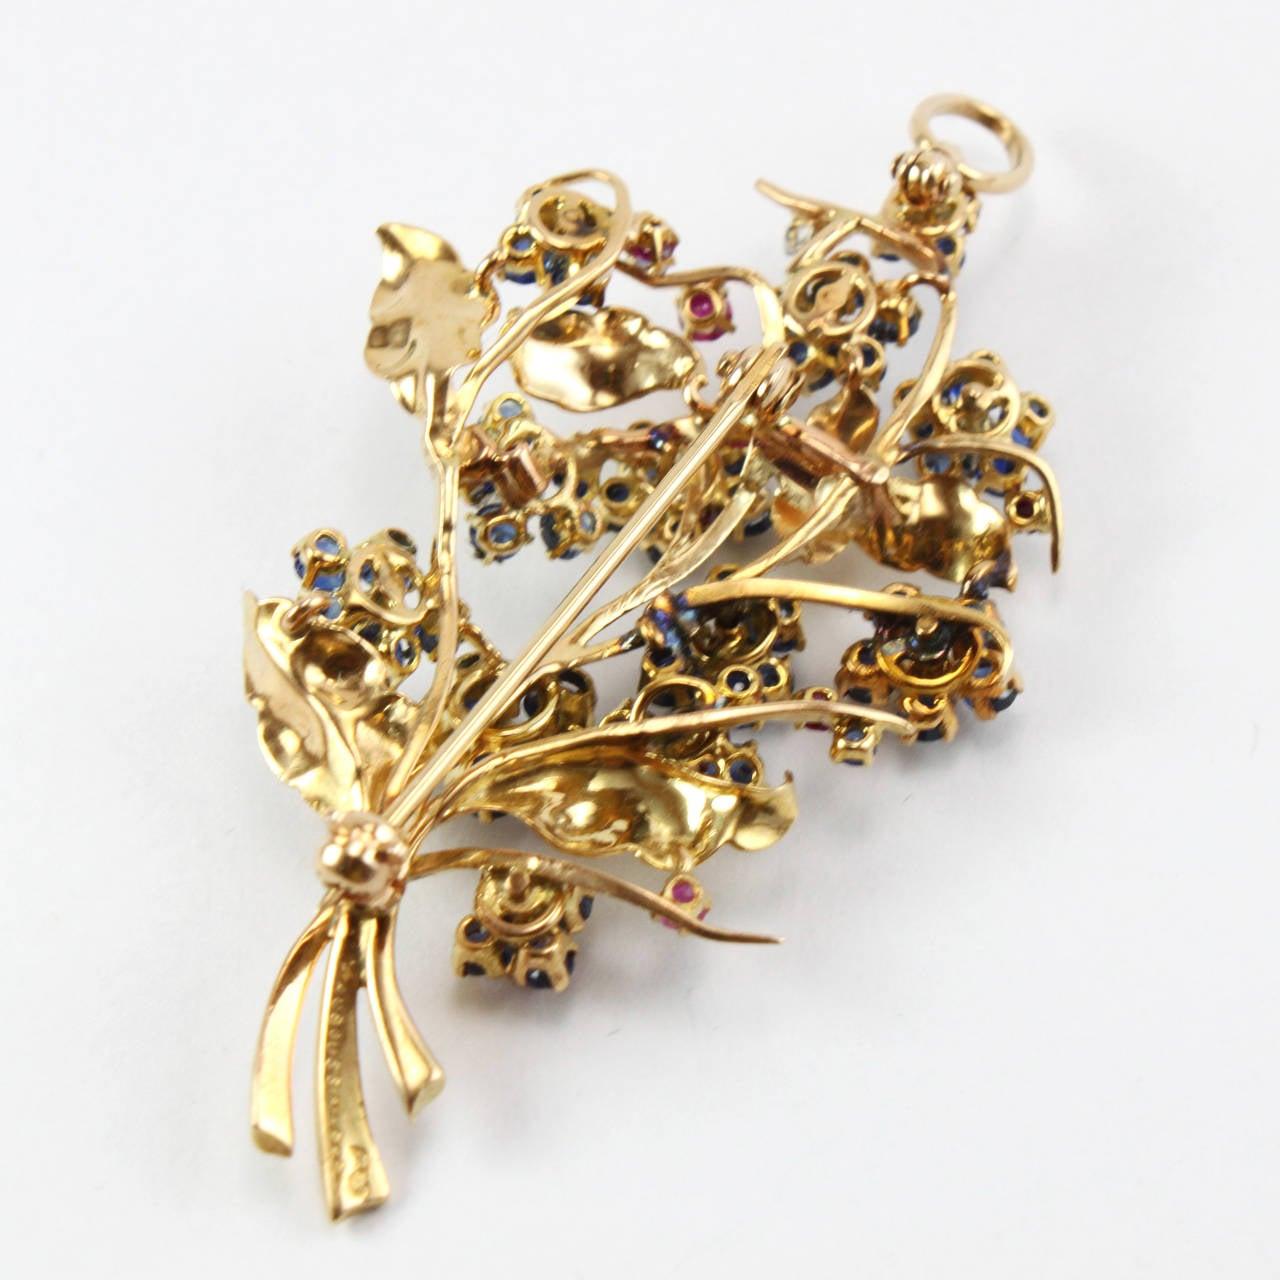 1948 Mauboussin Ruby Sapphire Diamond Flower Brooch or Pendant 4